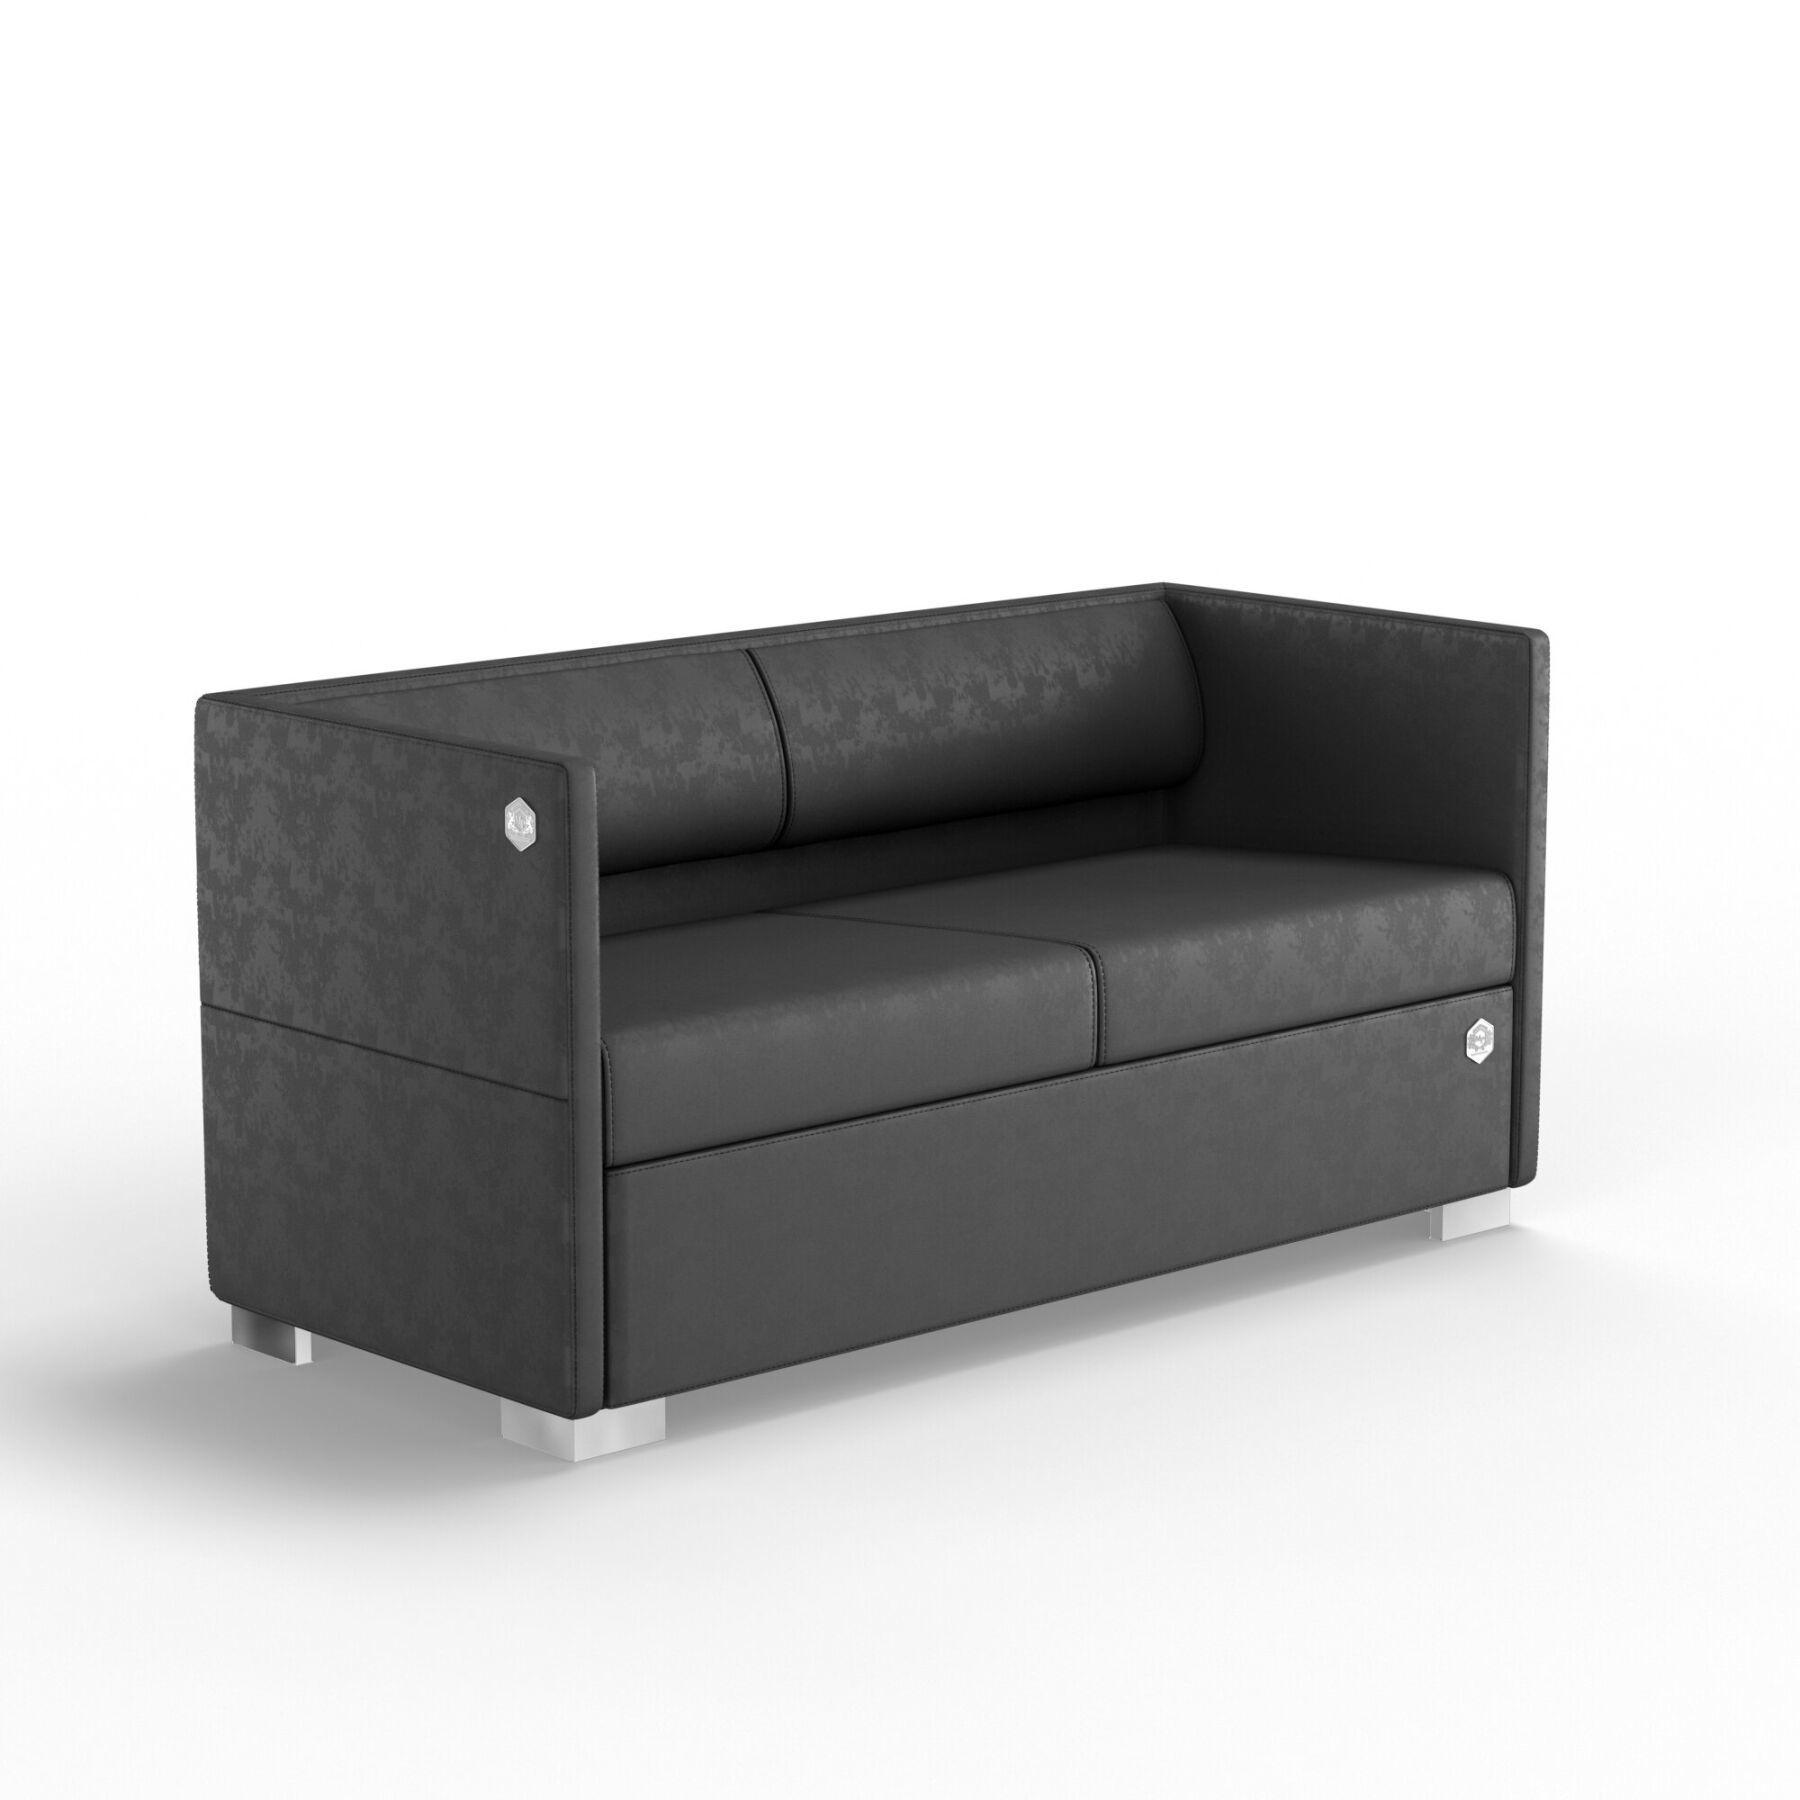 Двухместный диван KULIK SYSTEM LOUNGE Антара 2